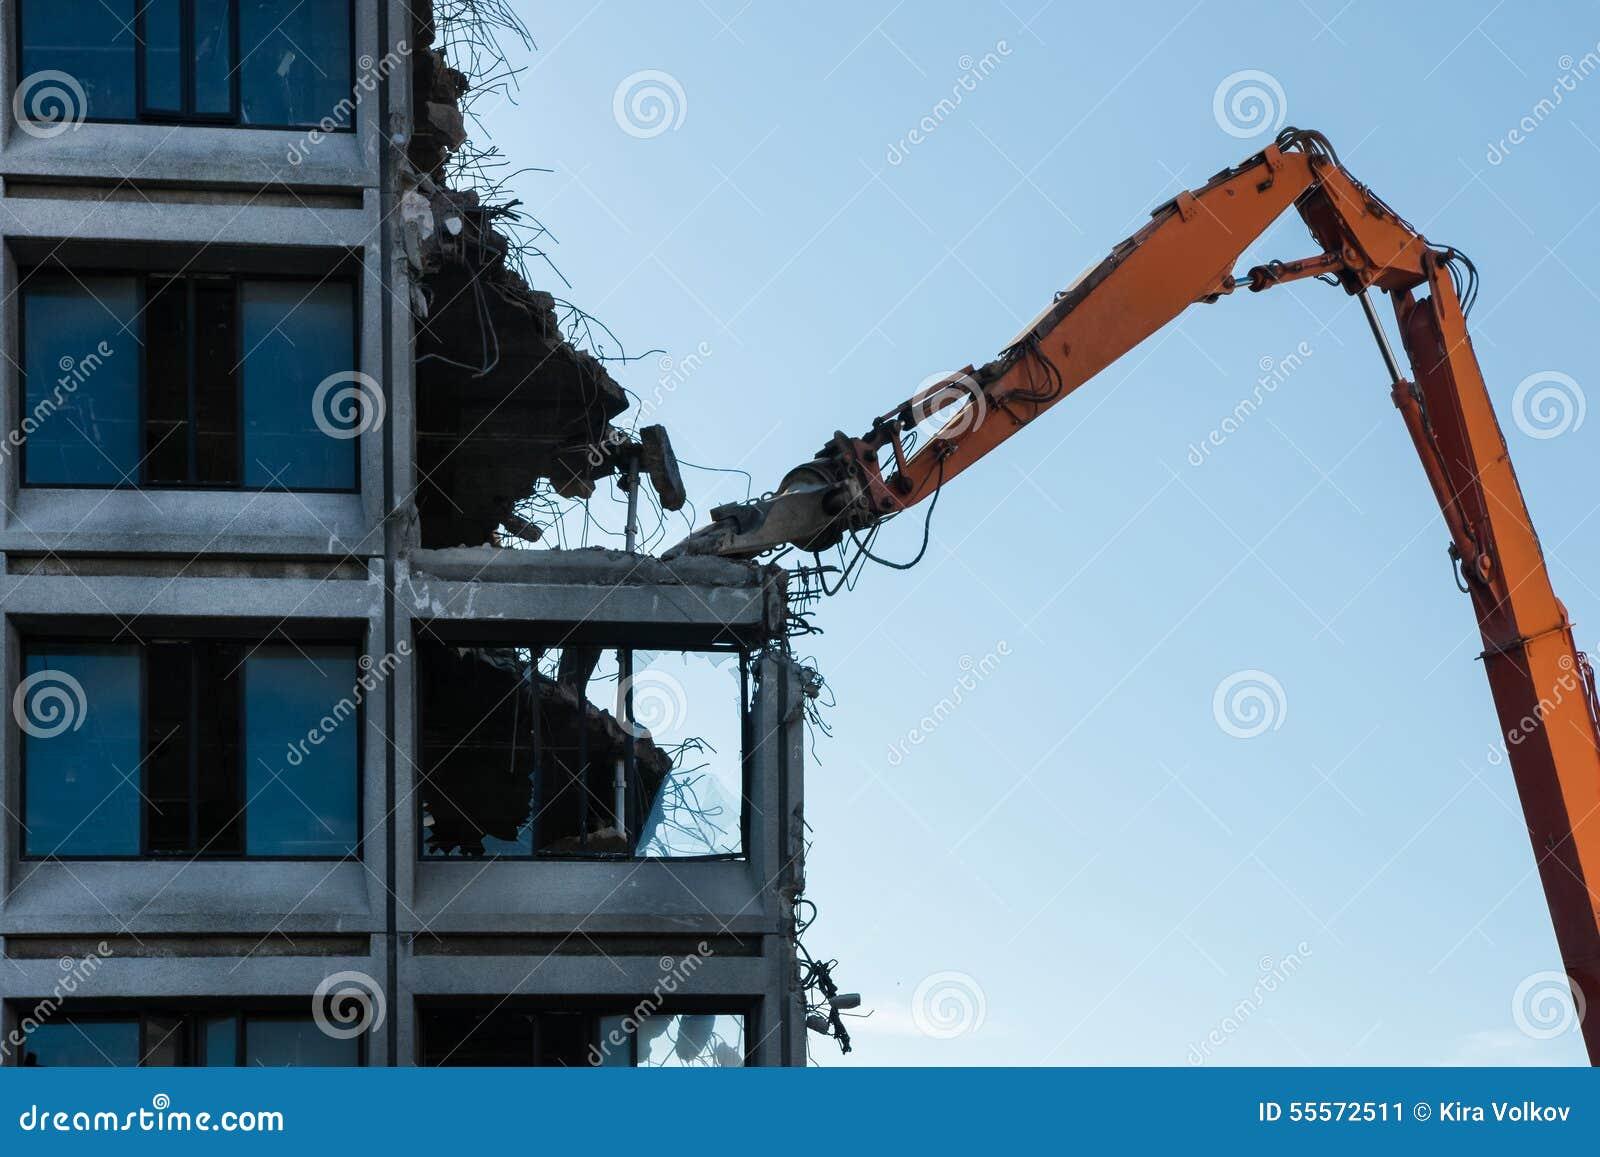 Building Demolition Cartoon : Demolition of the building royalty free stock image